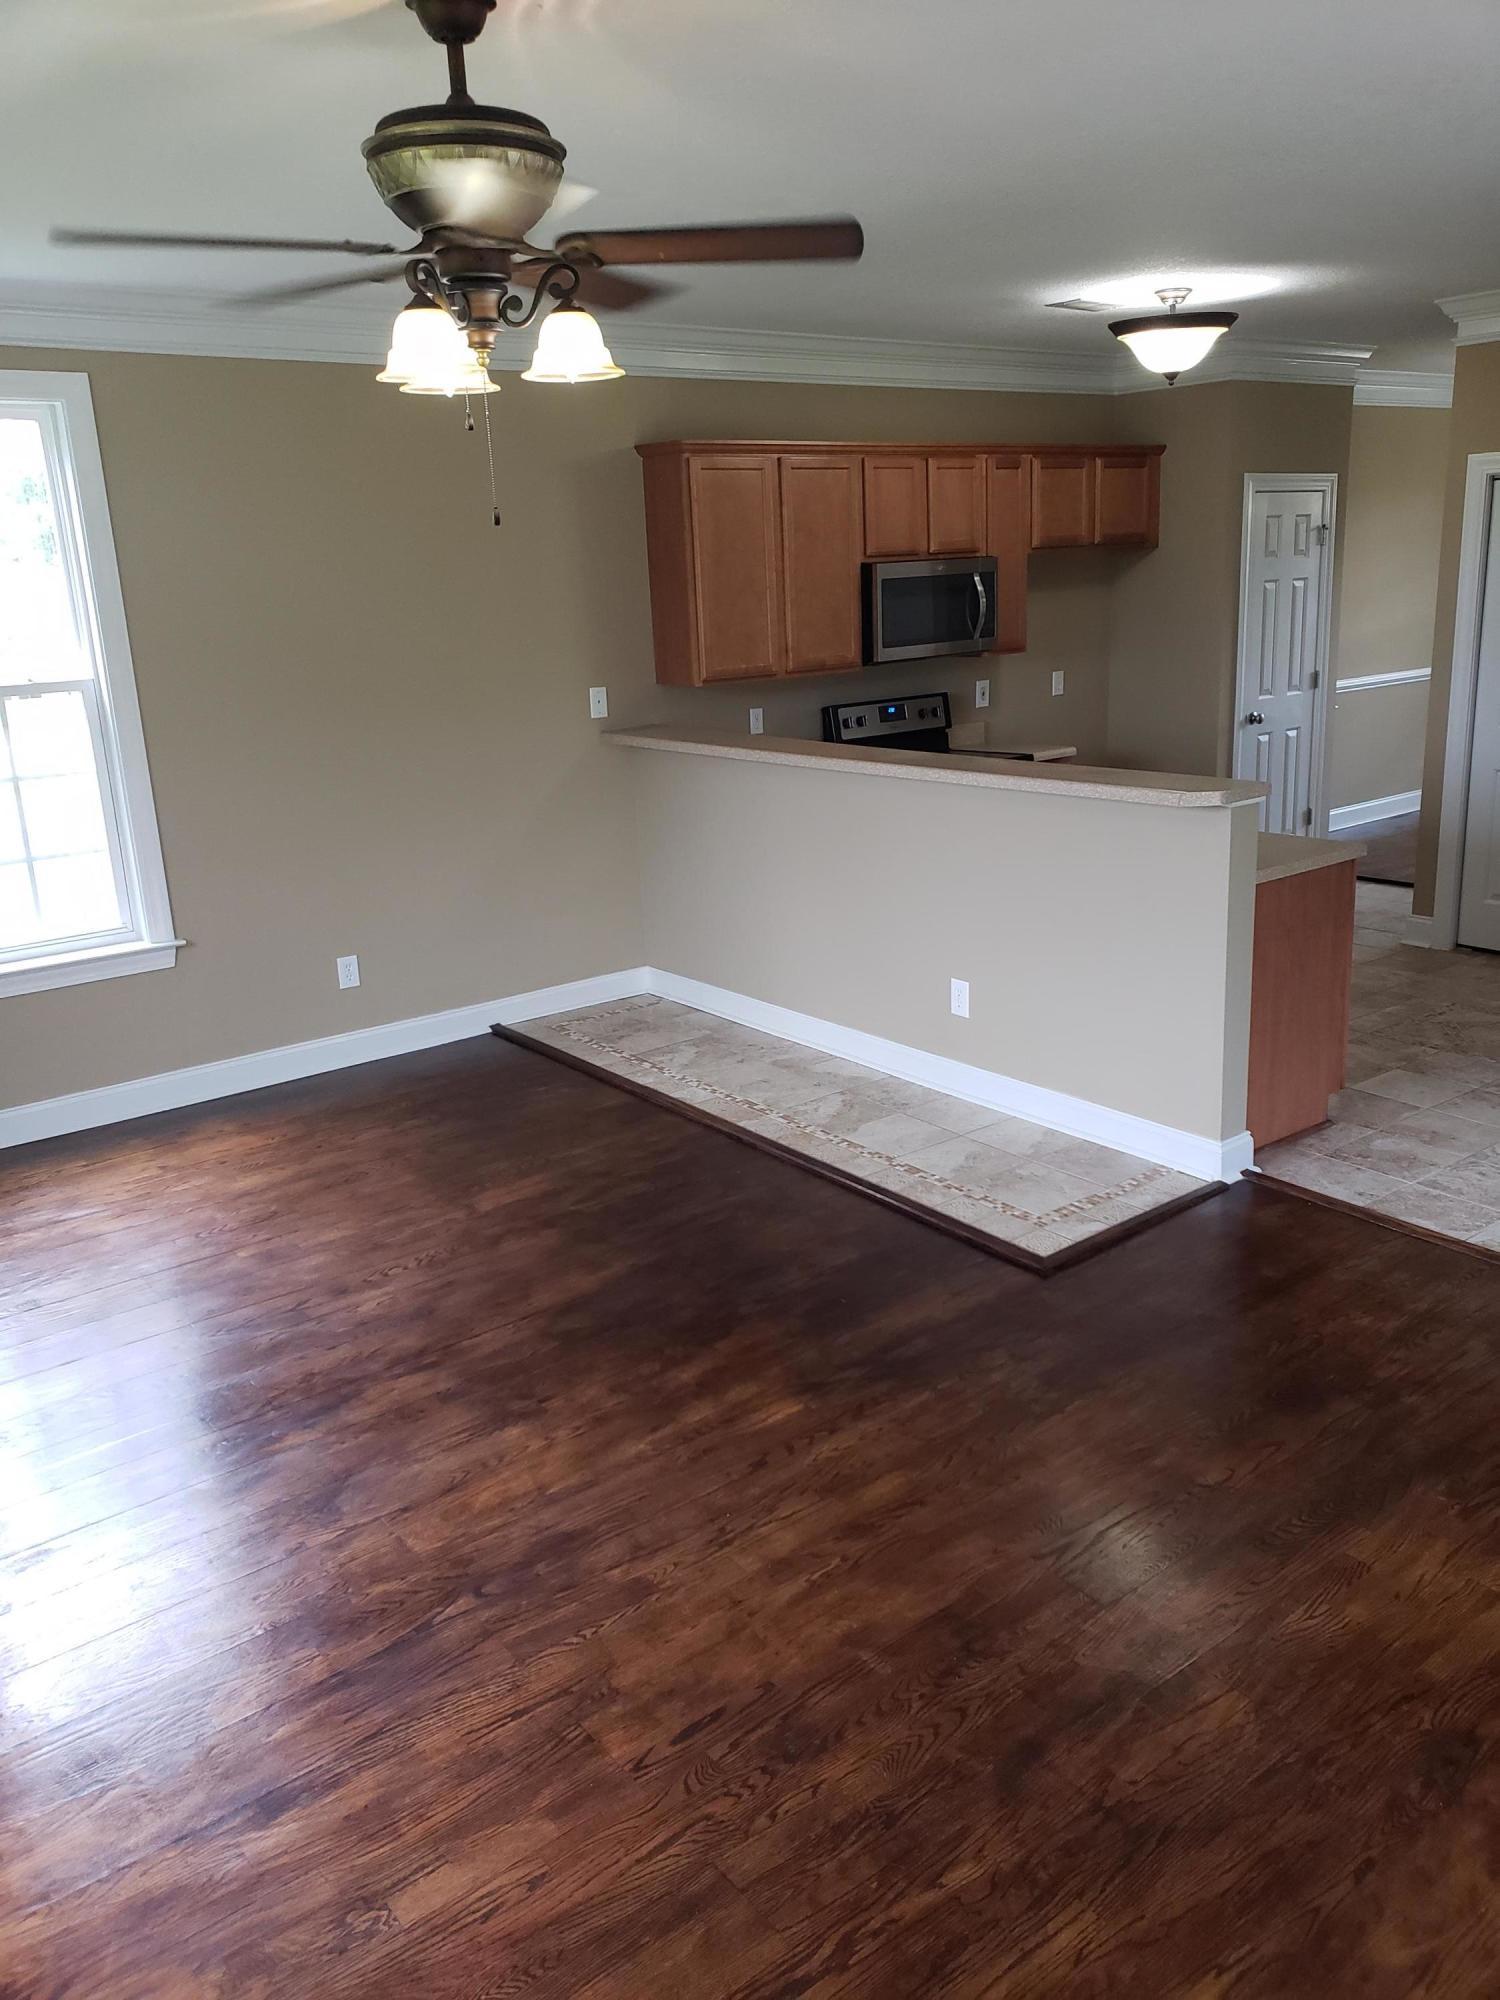 Montague Pointe Homes For Sale - 100 Gavins, Goose Creek, SC - 13